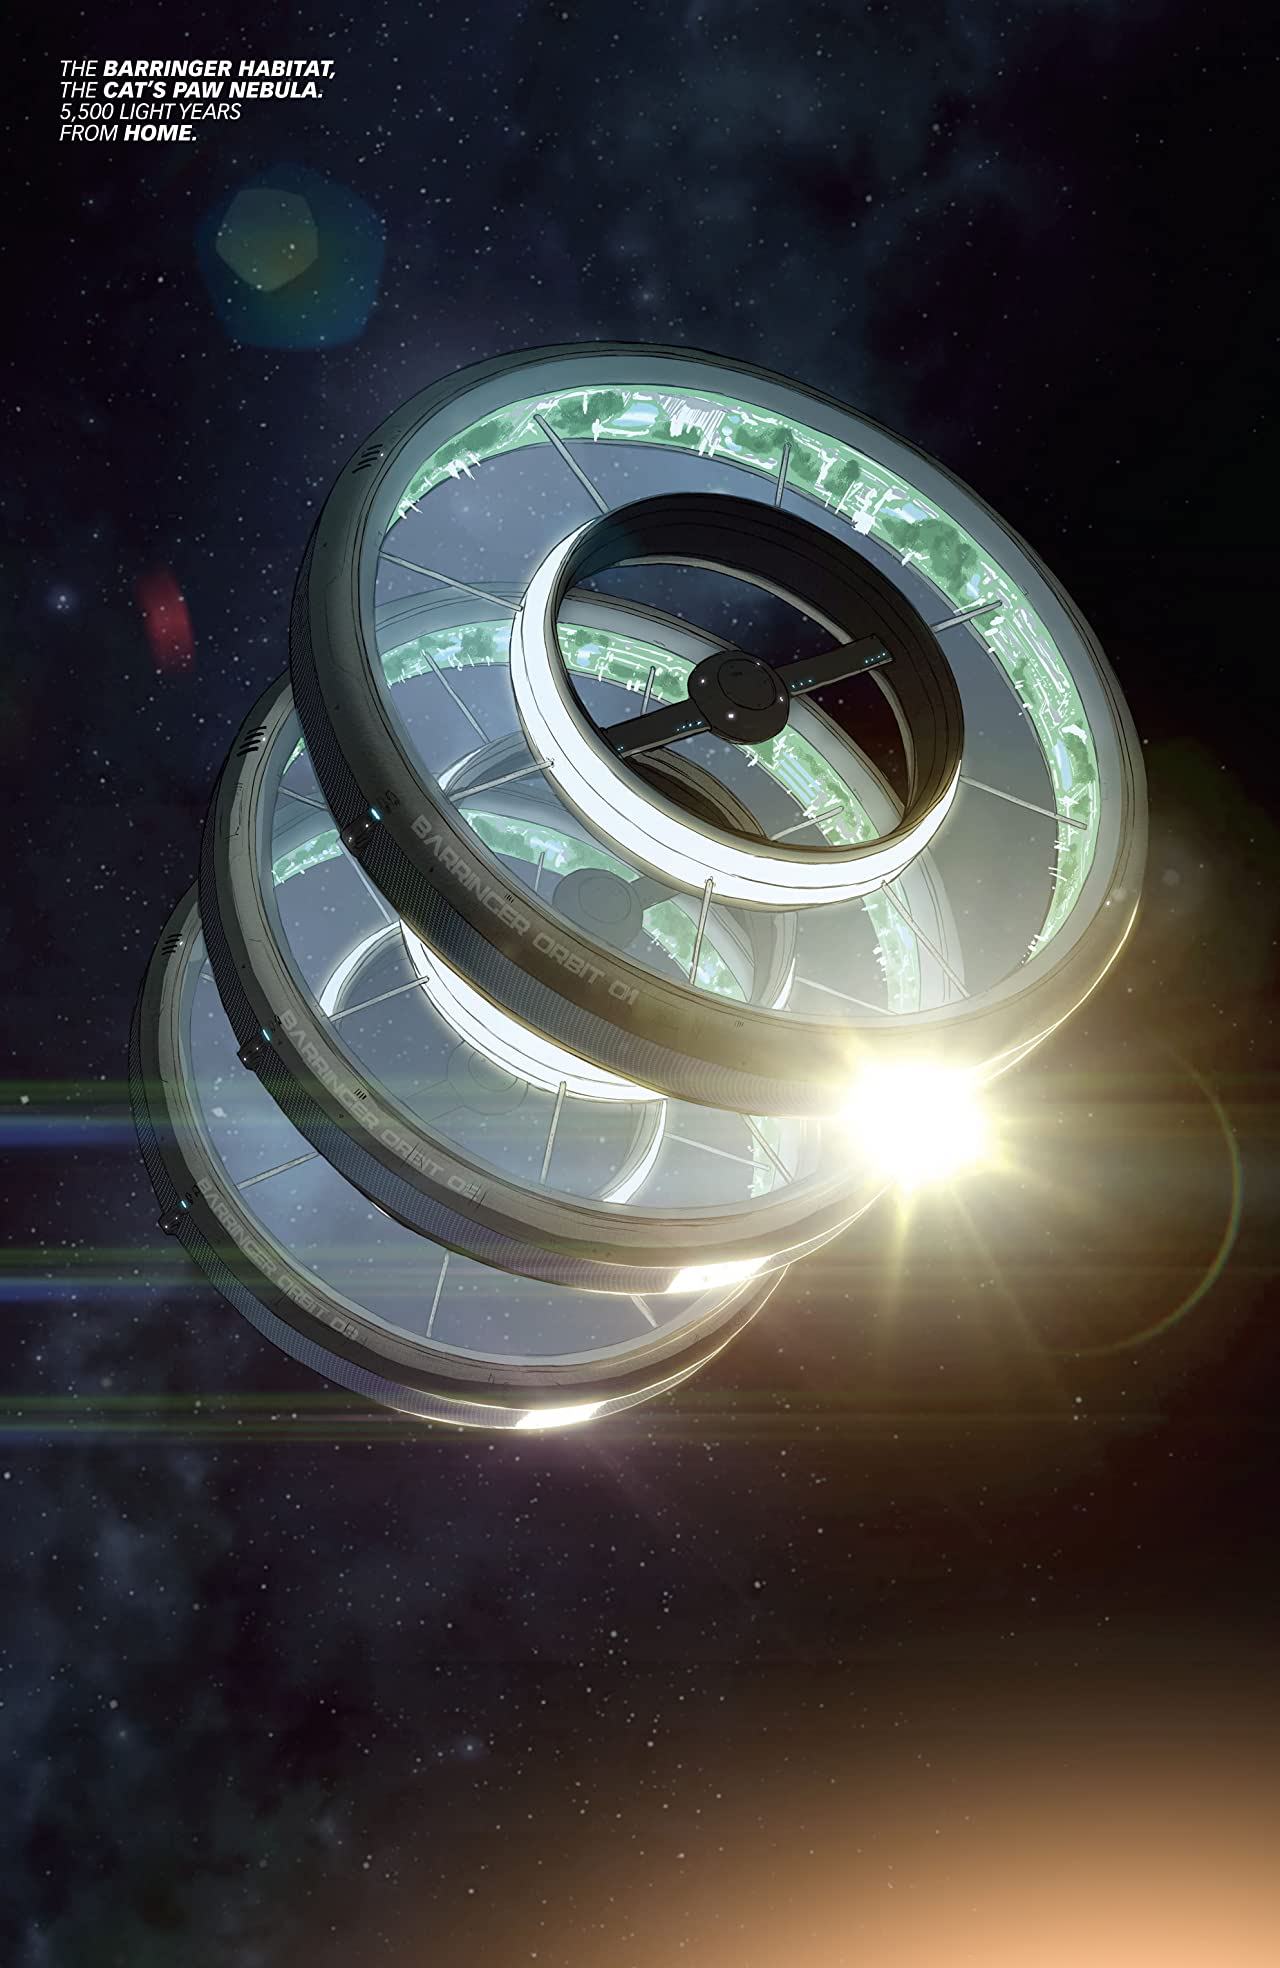 John Carpenter's Tales of Science Fiction: VORTEX 2.0 #1